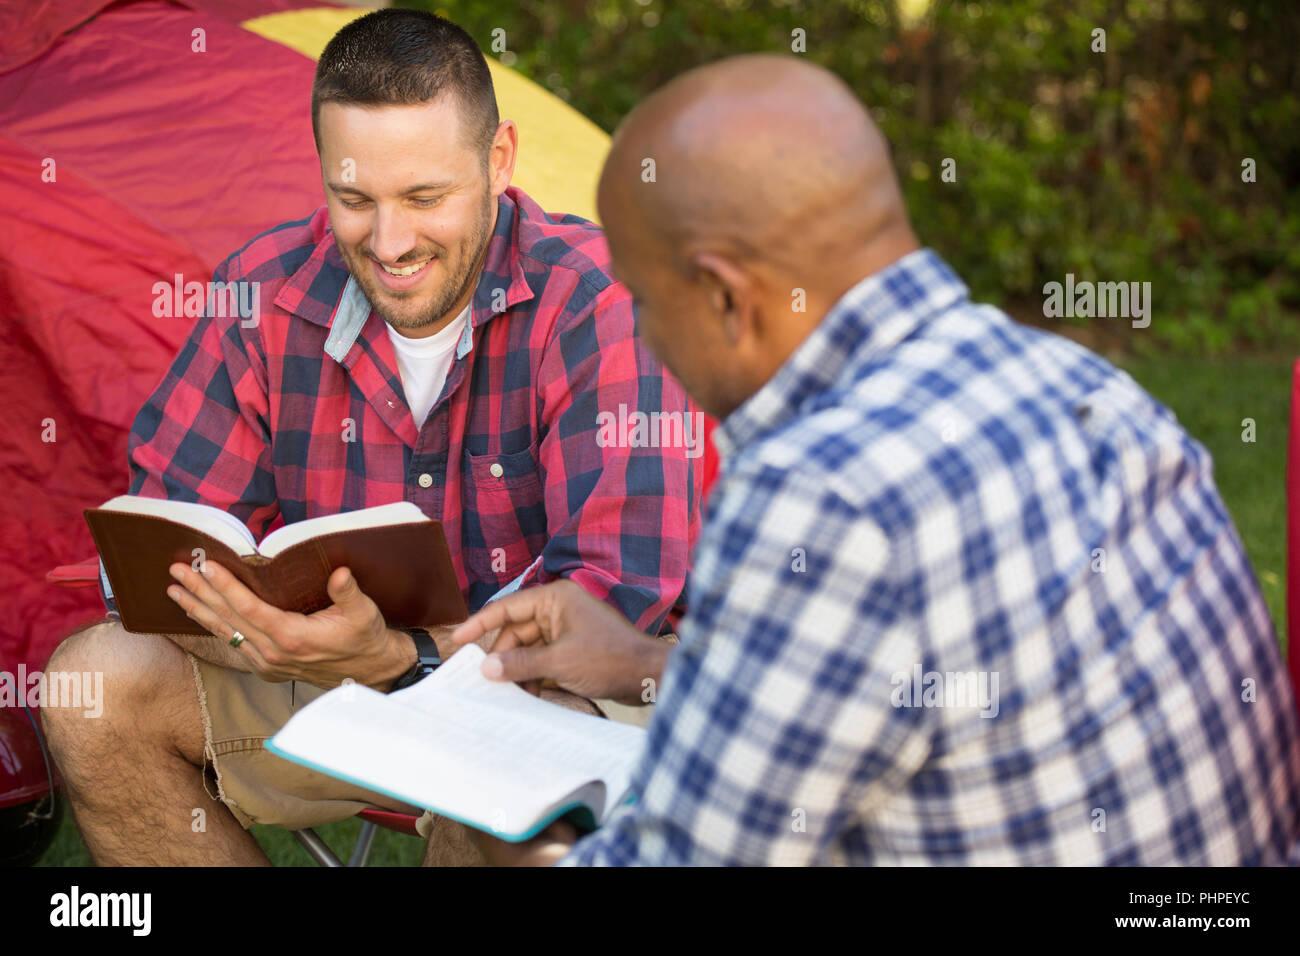 Men having a bible study. - Stock Image